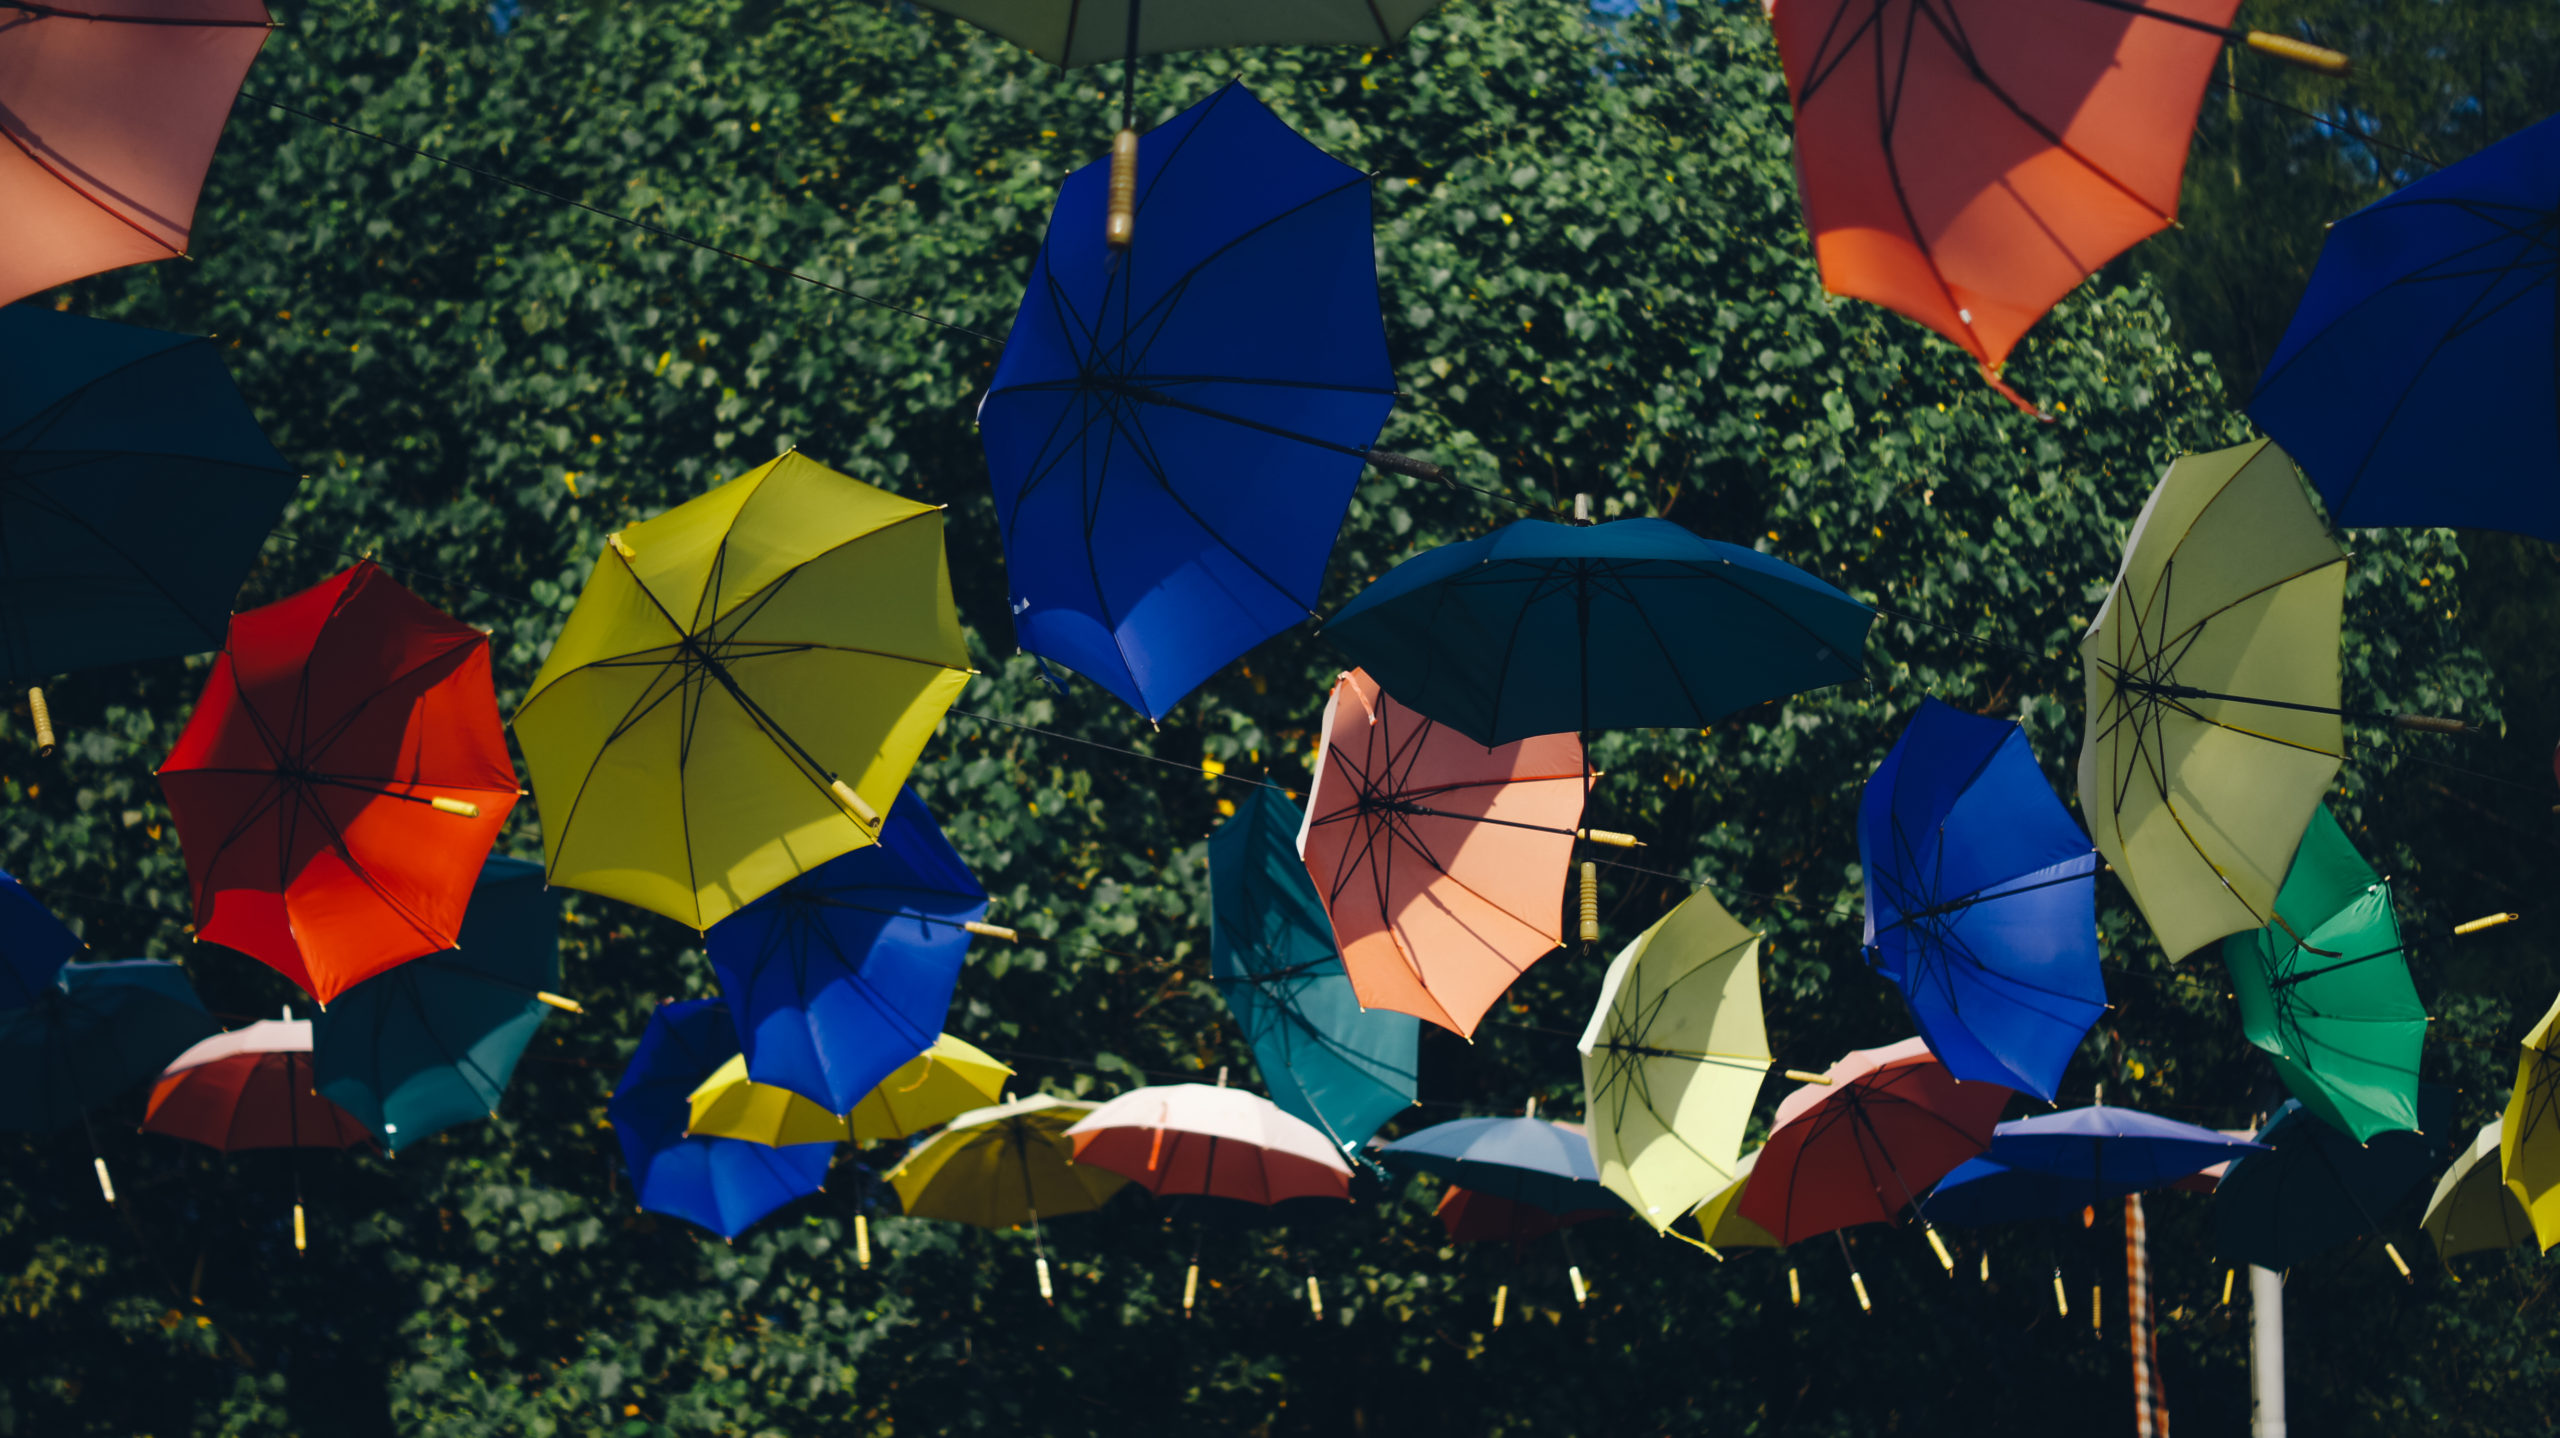 Parapluies qui s'envolent